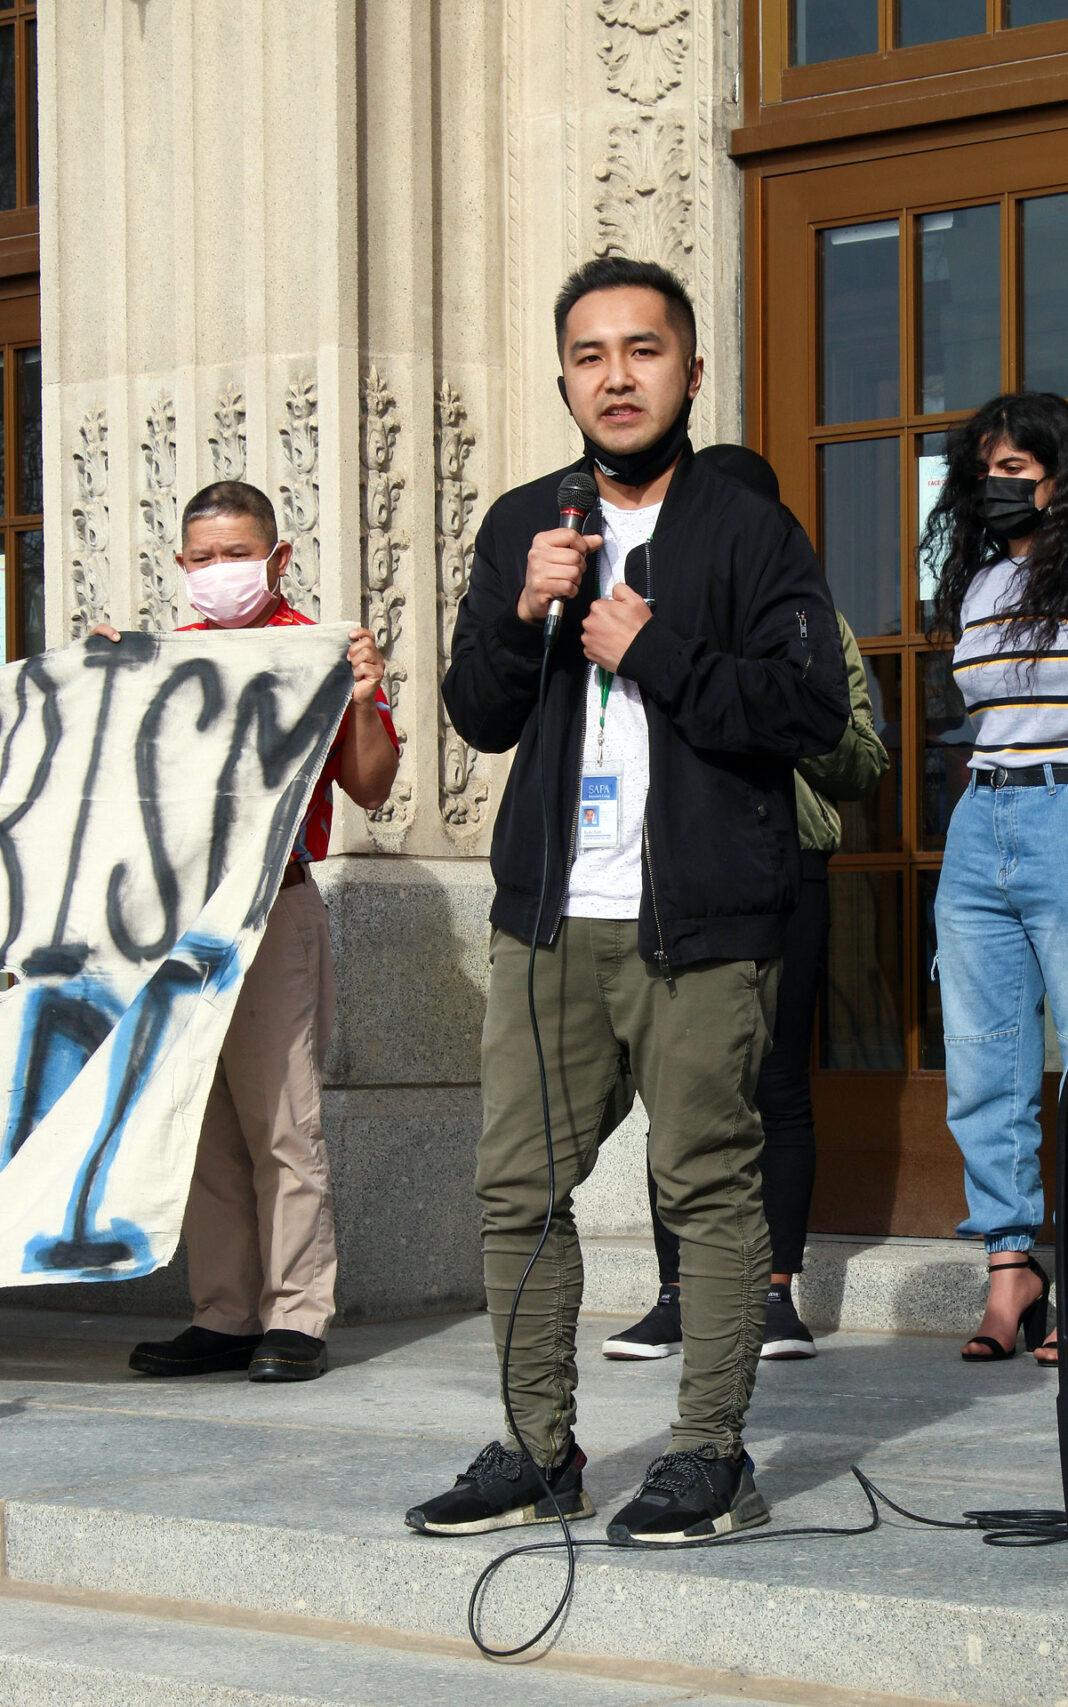 Ricky Panh speaking at vigil